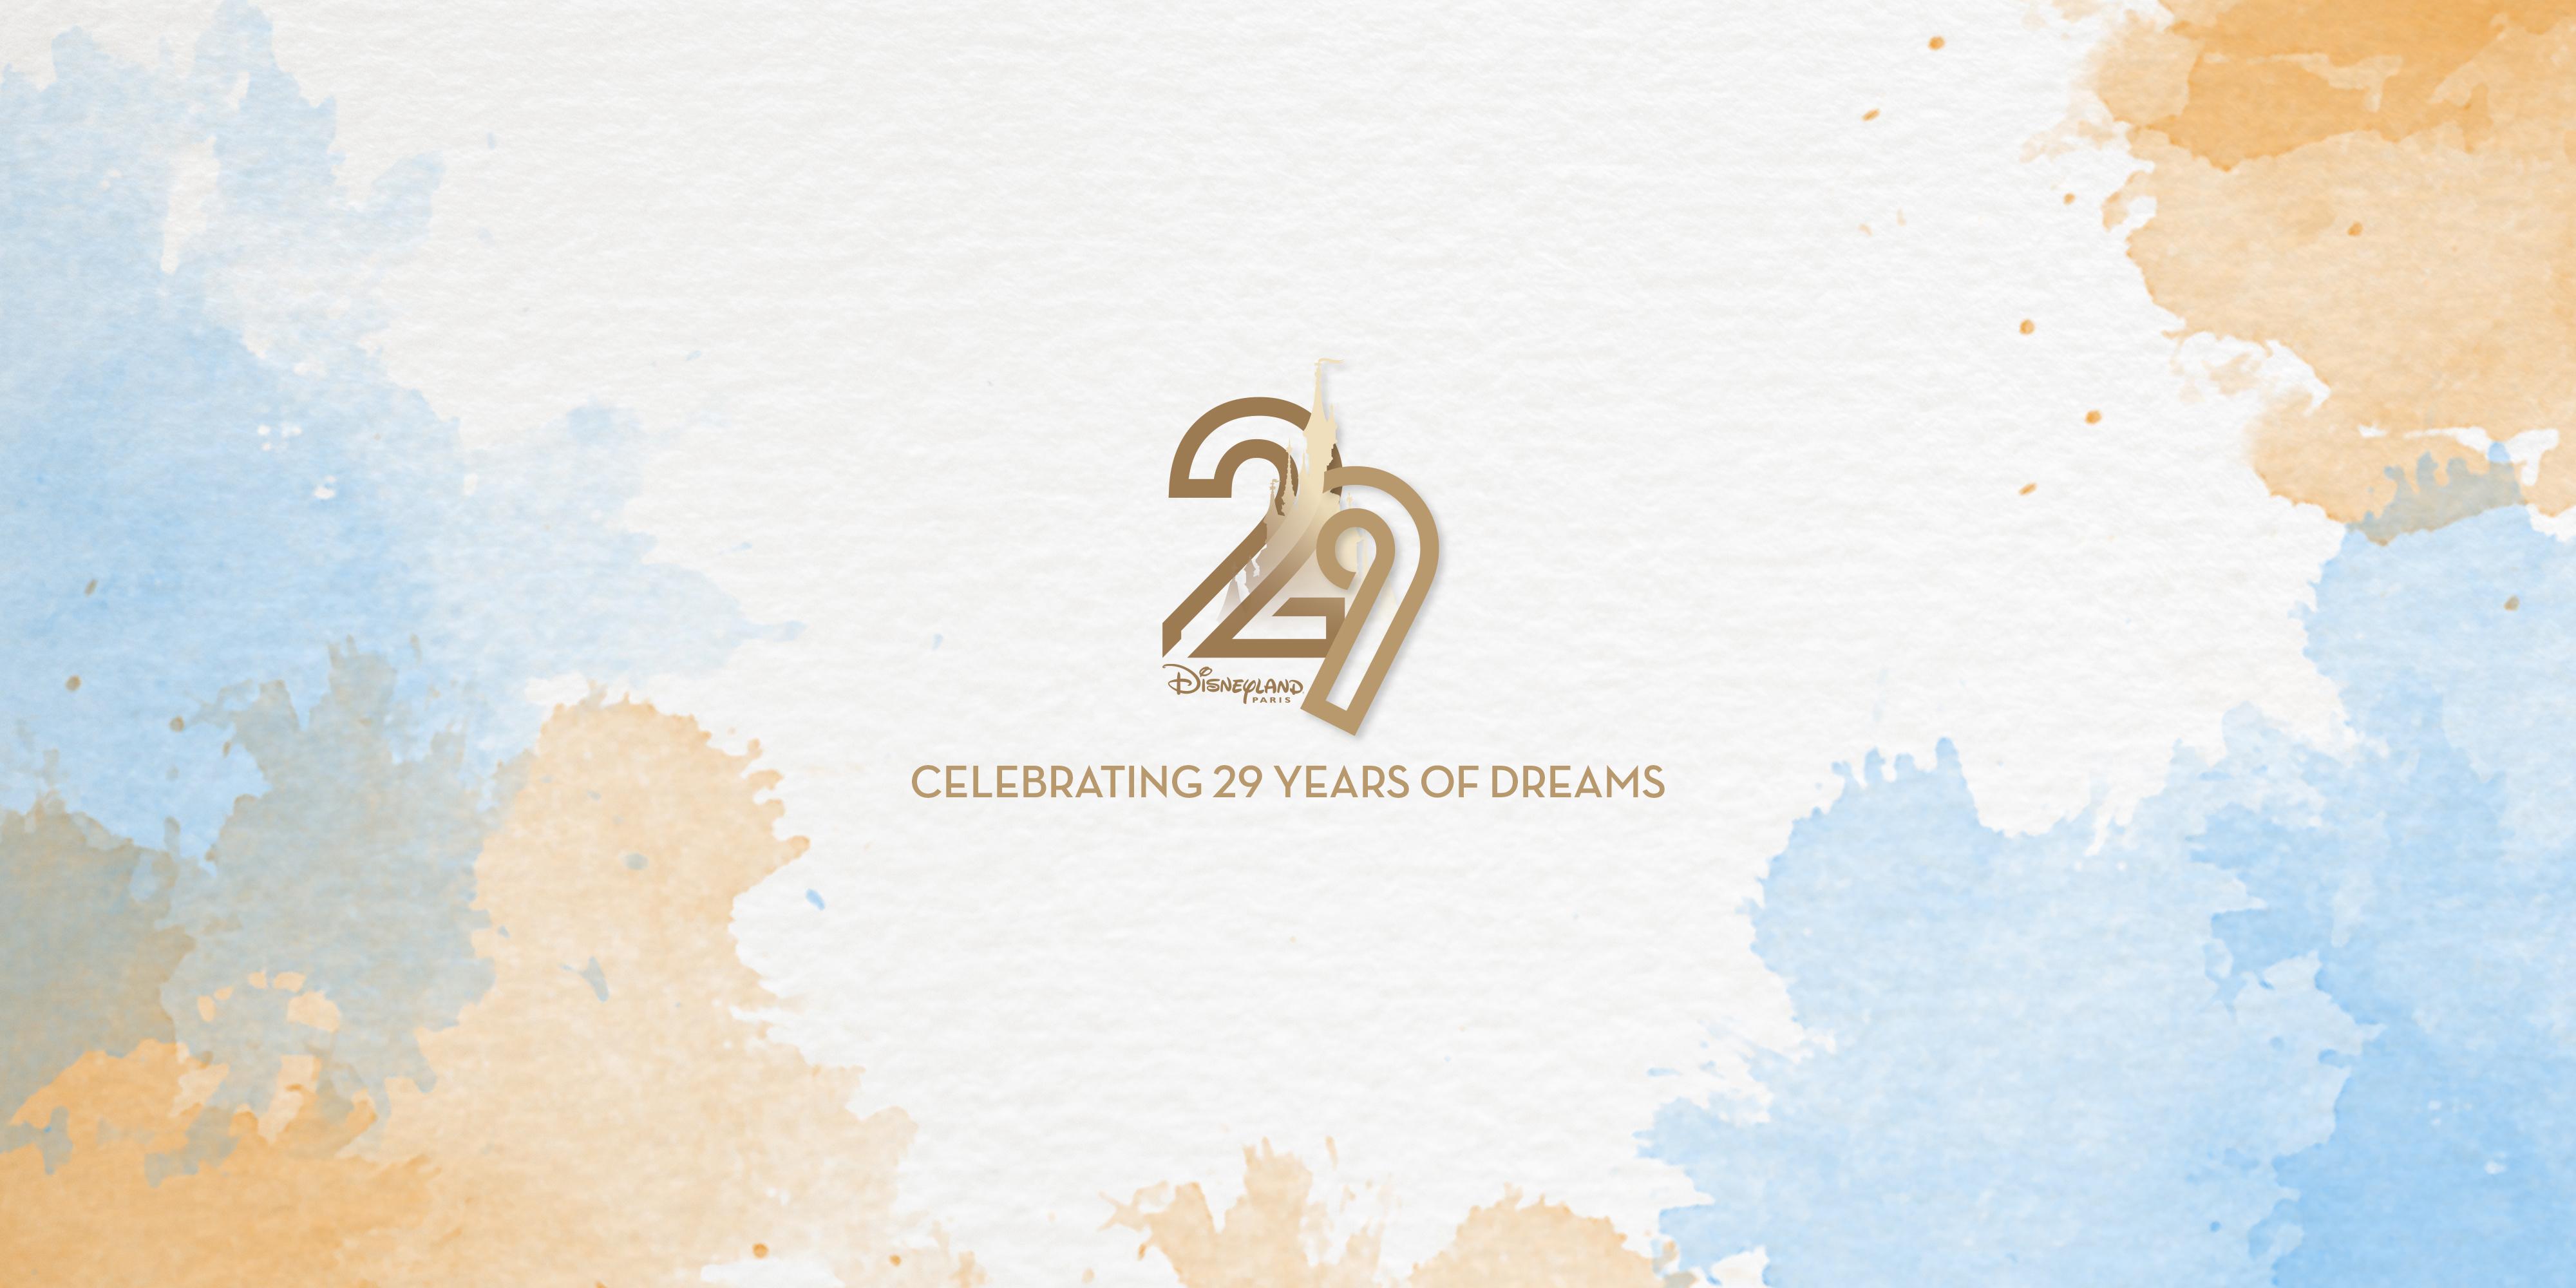 Disneyland Paris - 29th Anniversary